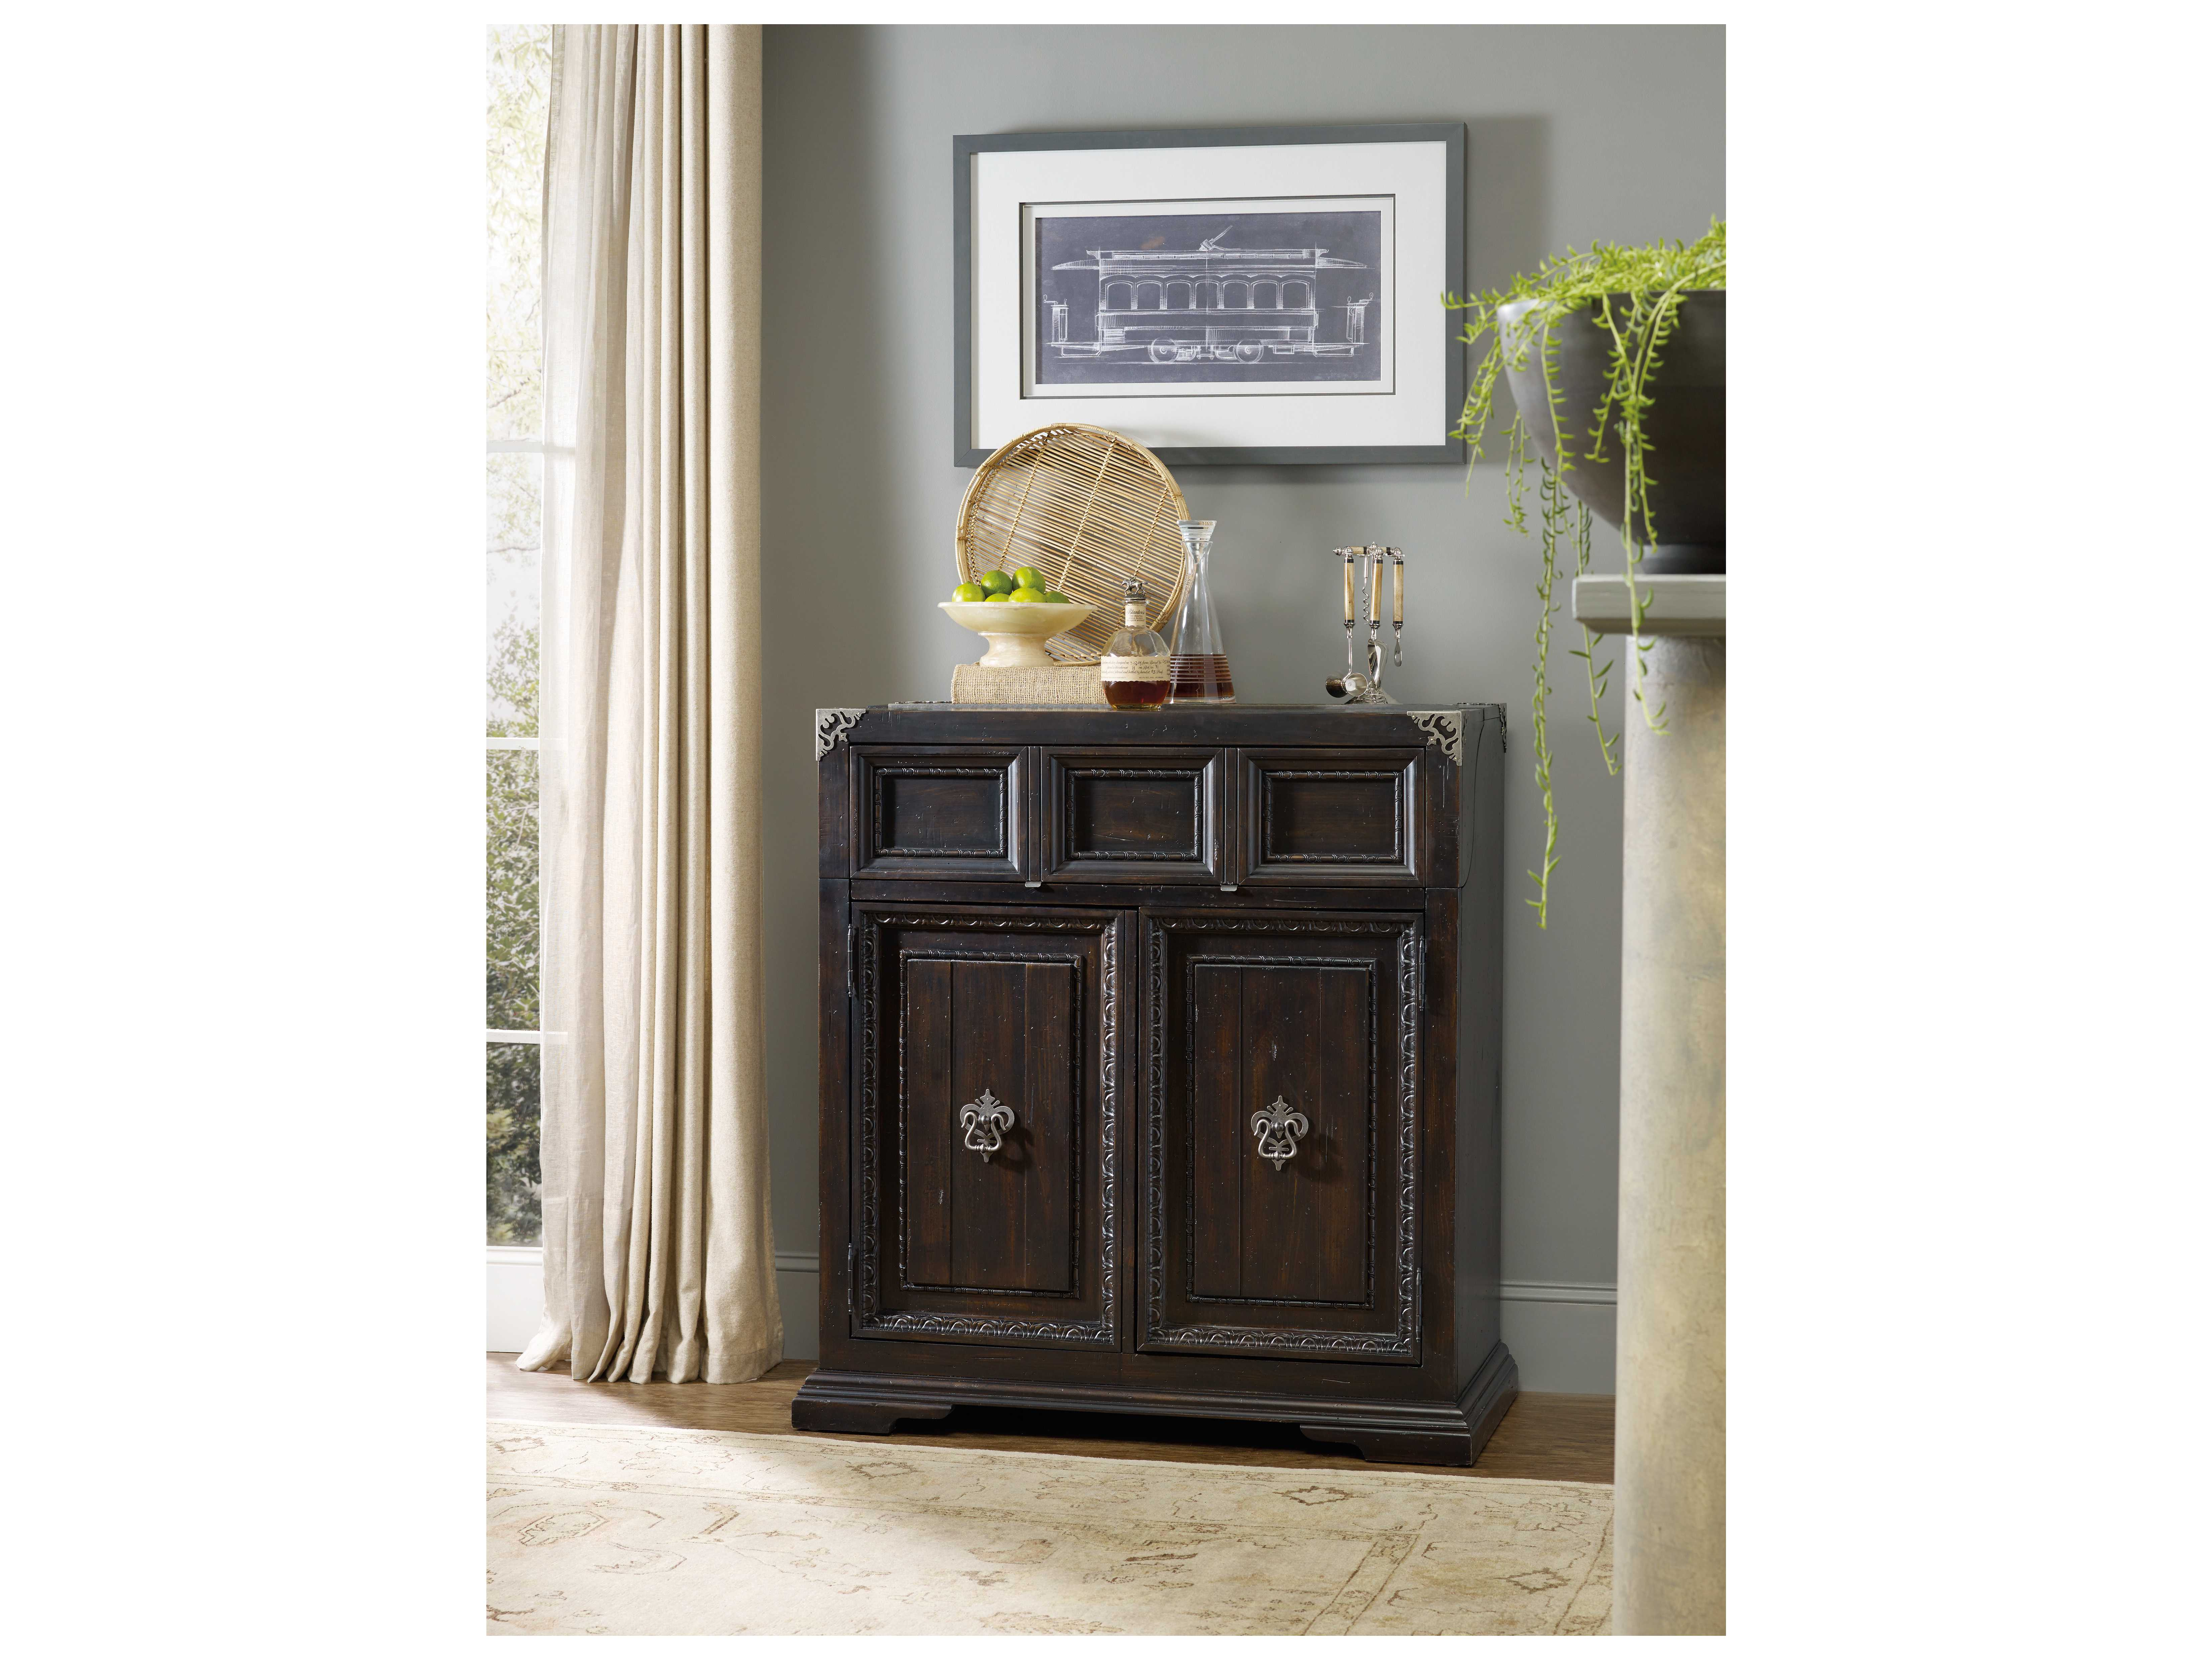 Hooker Furniture Treviso Rich Dark Macchiato Bar Cabinet